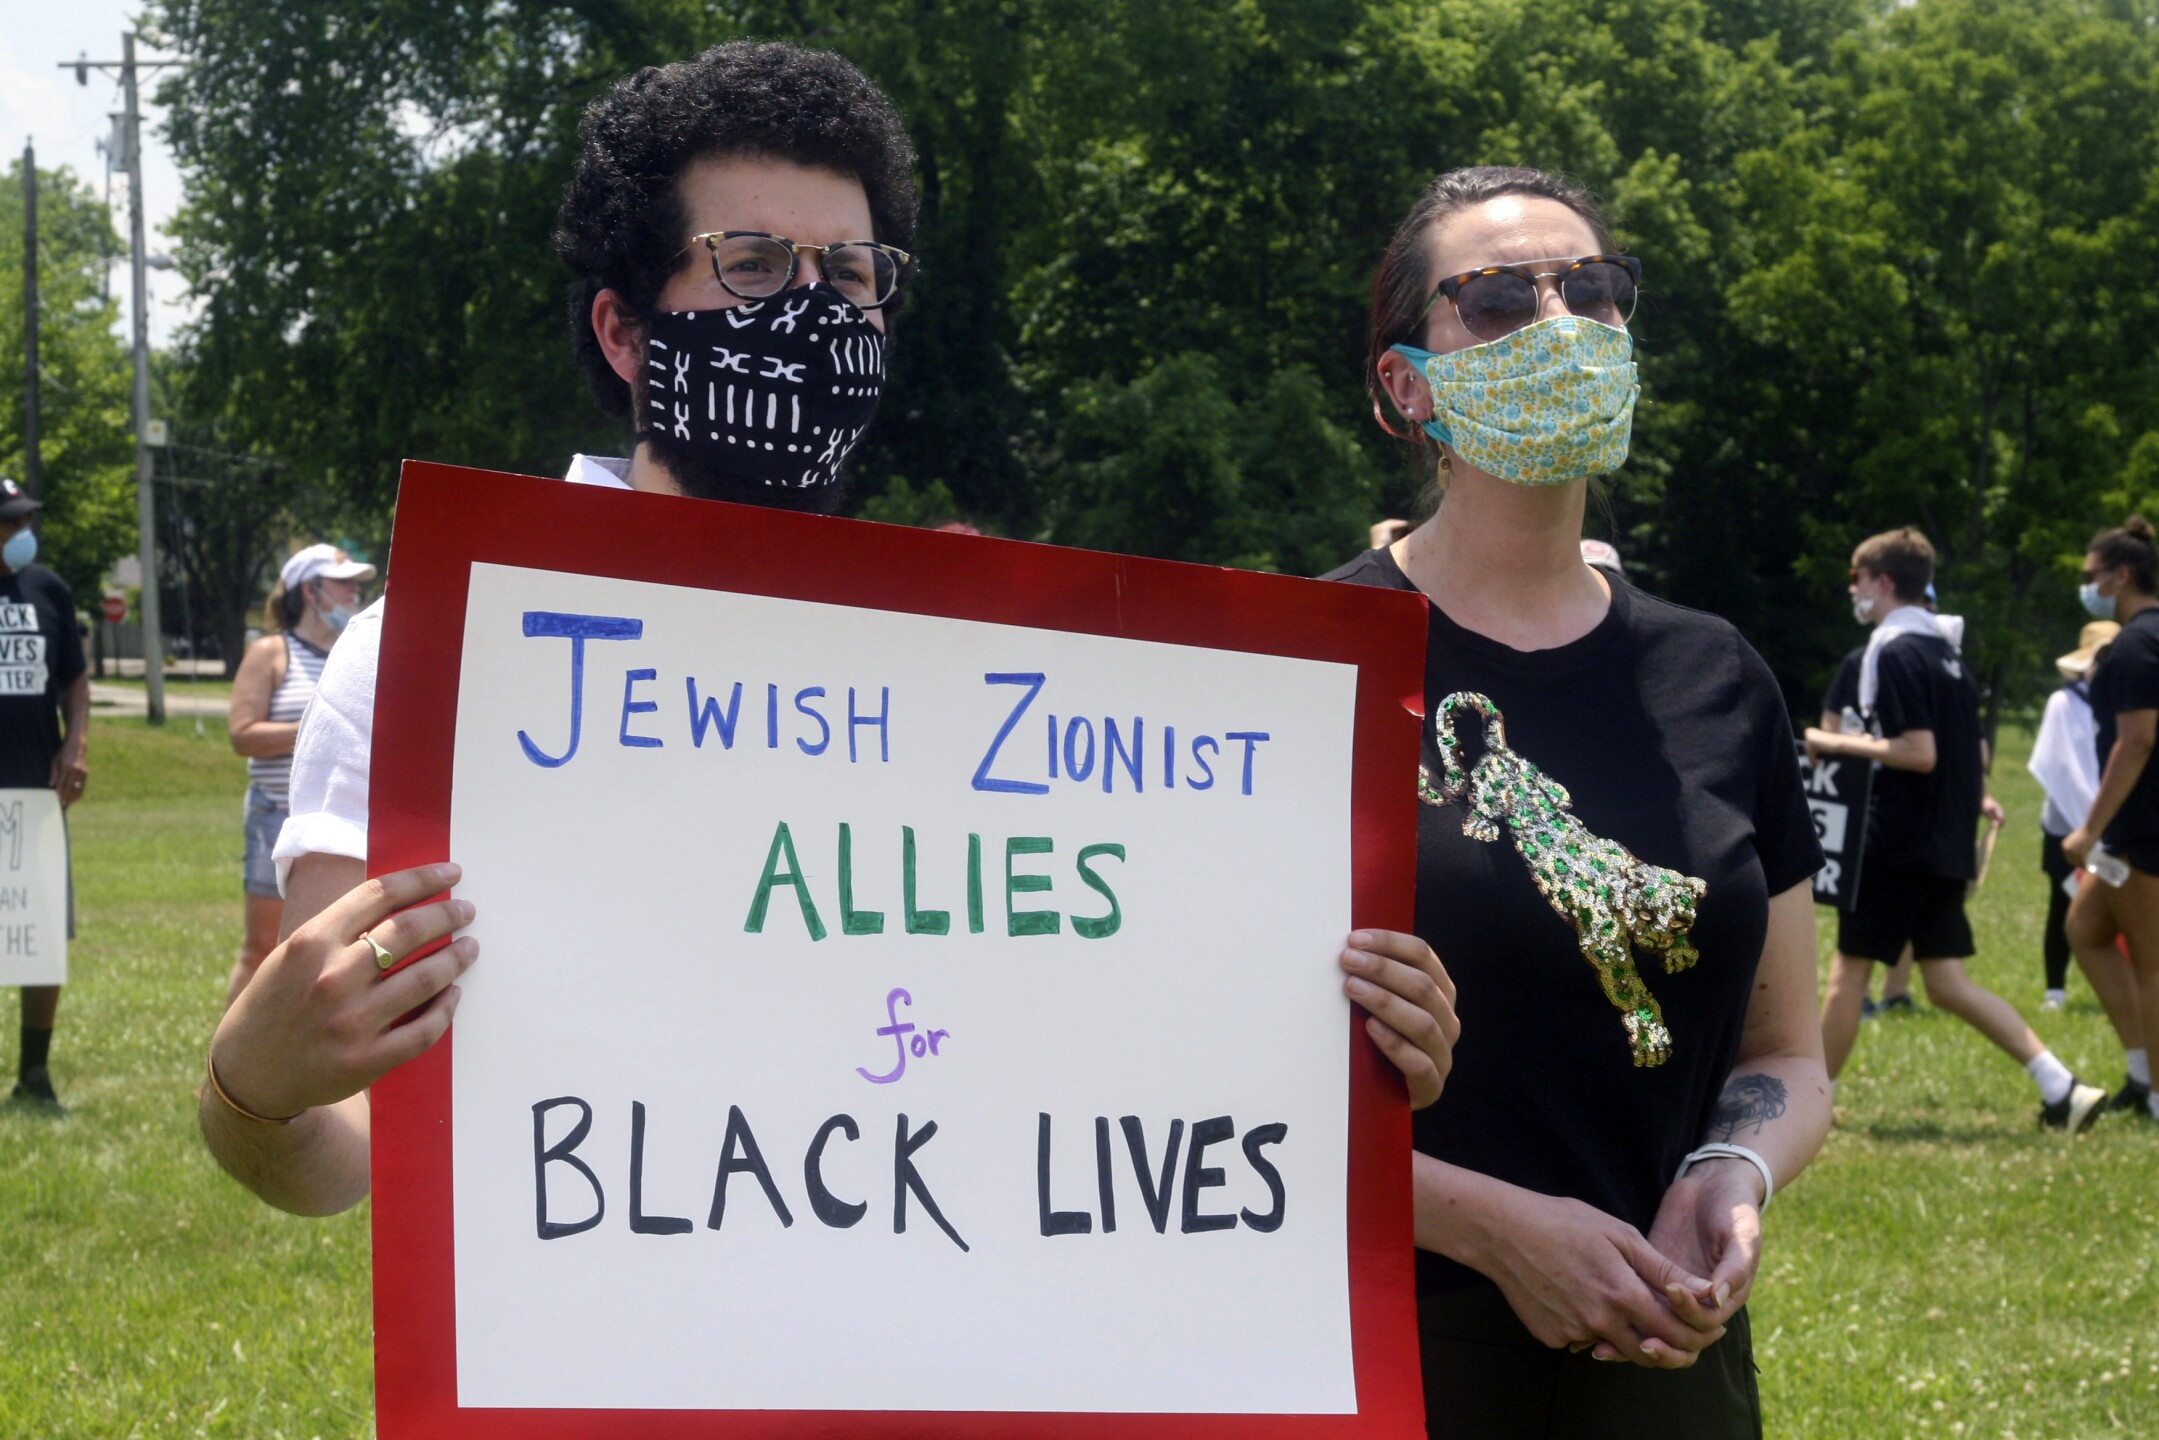 062020_milfordprotest1.jpg